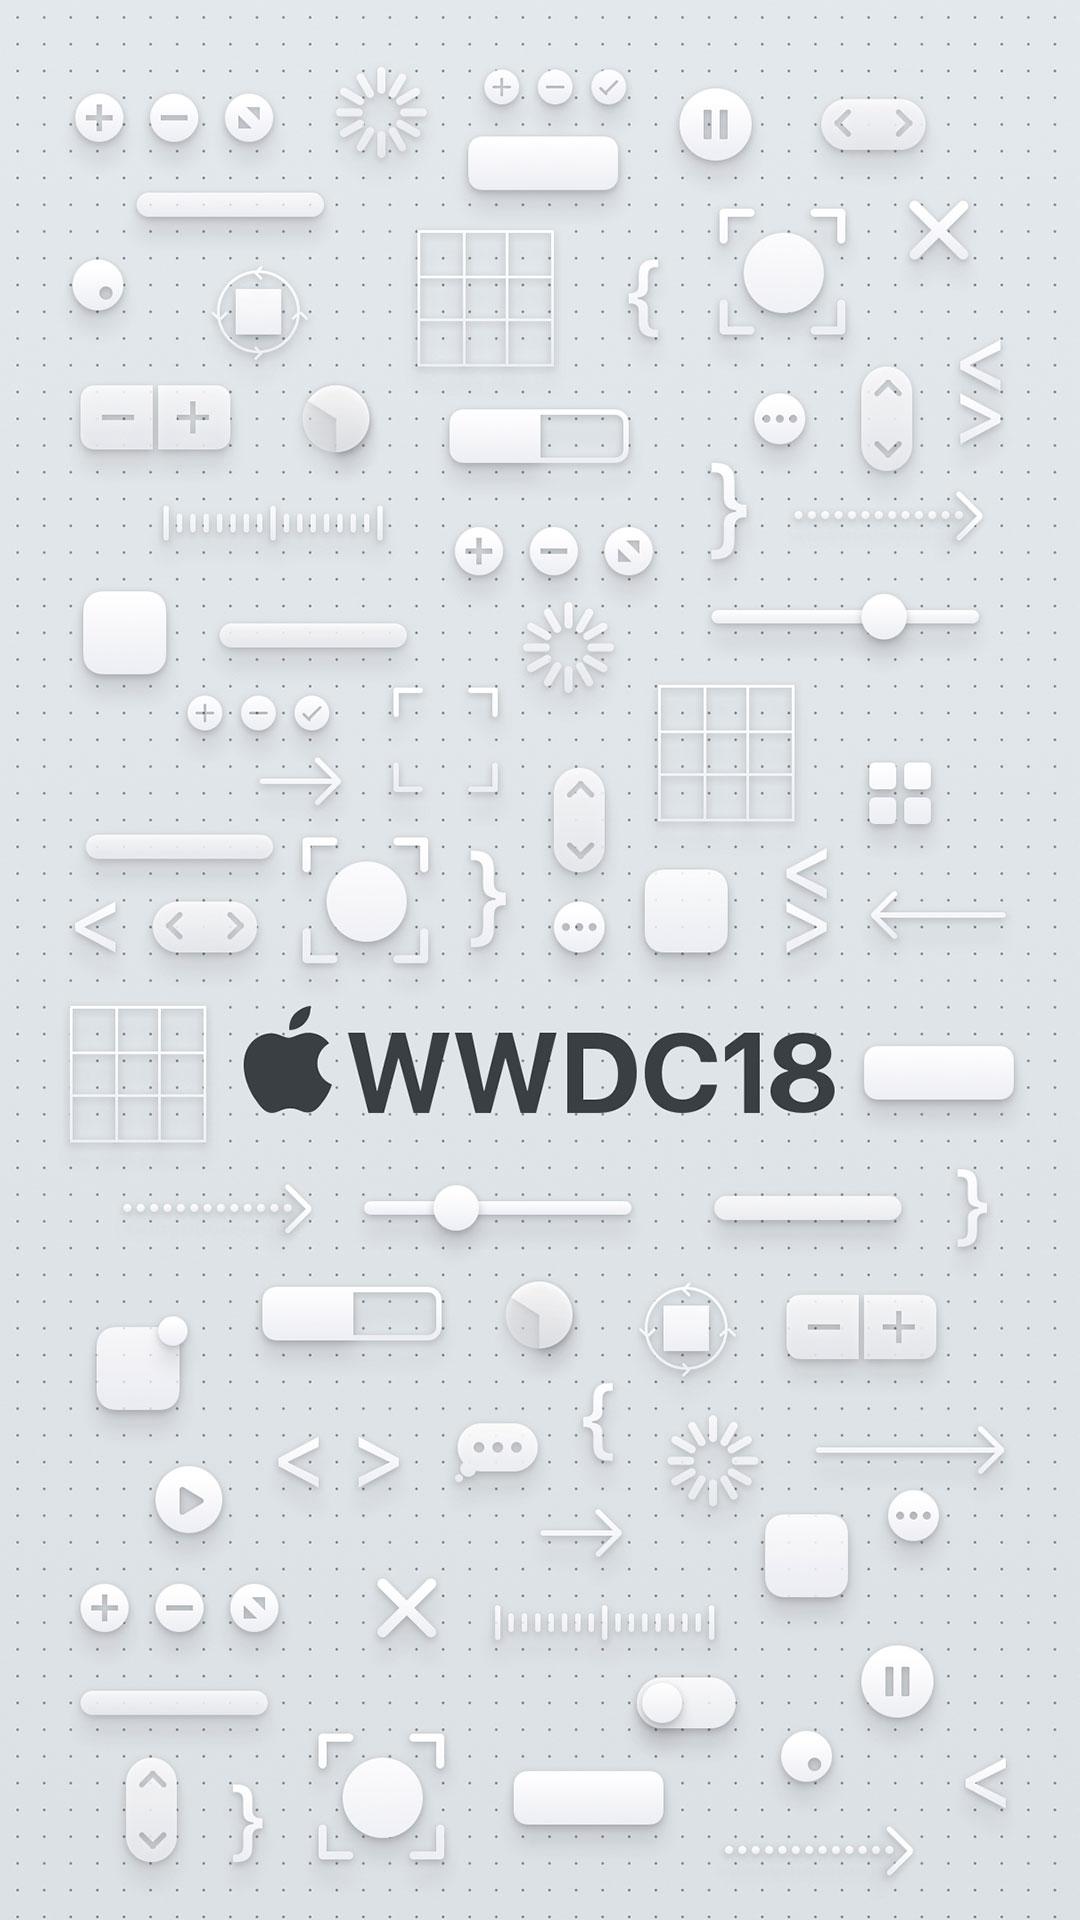 iPhone wallpaper wwdc icons white WWDC18